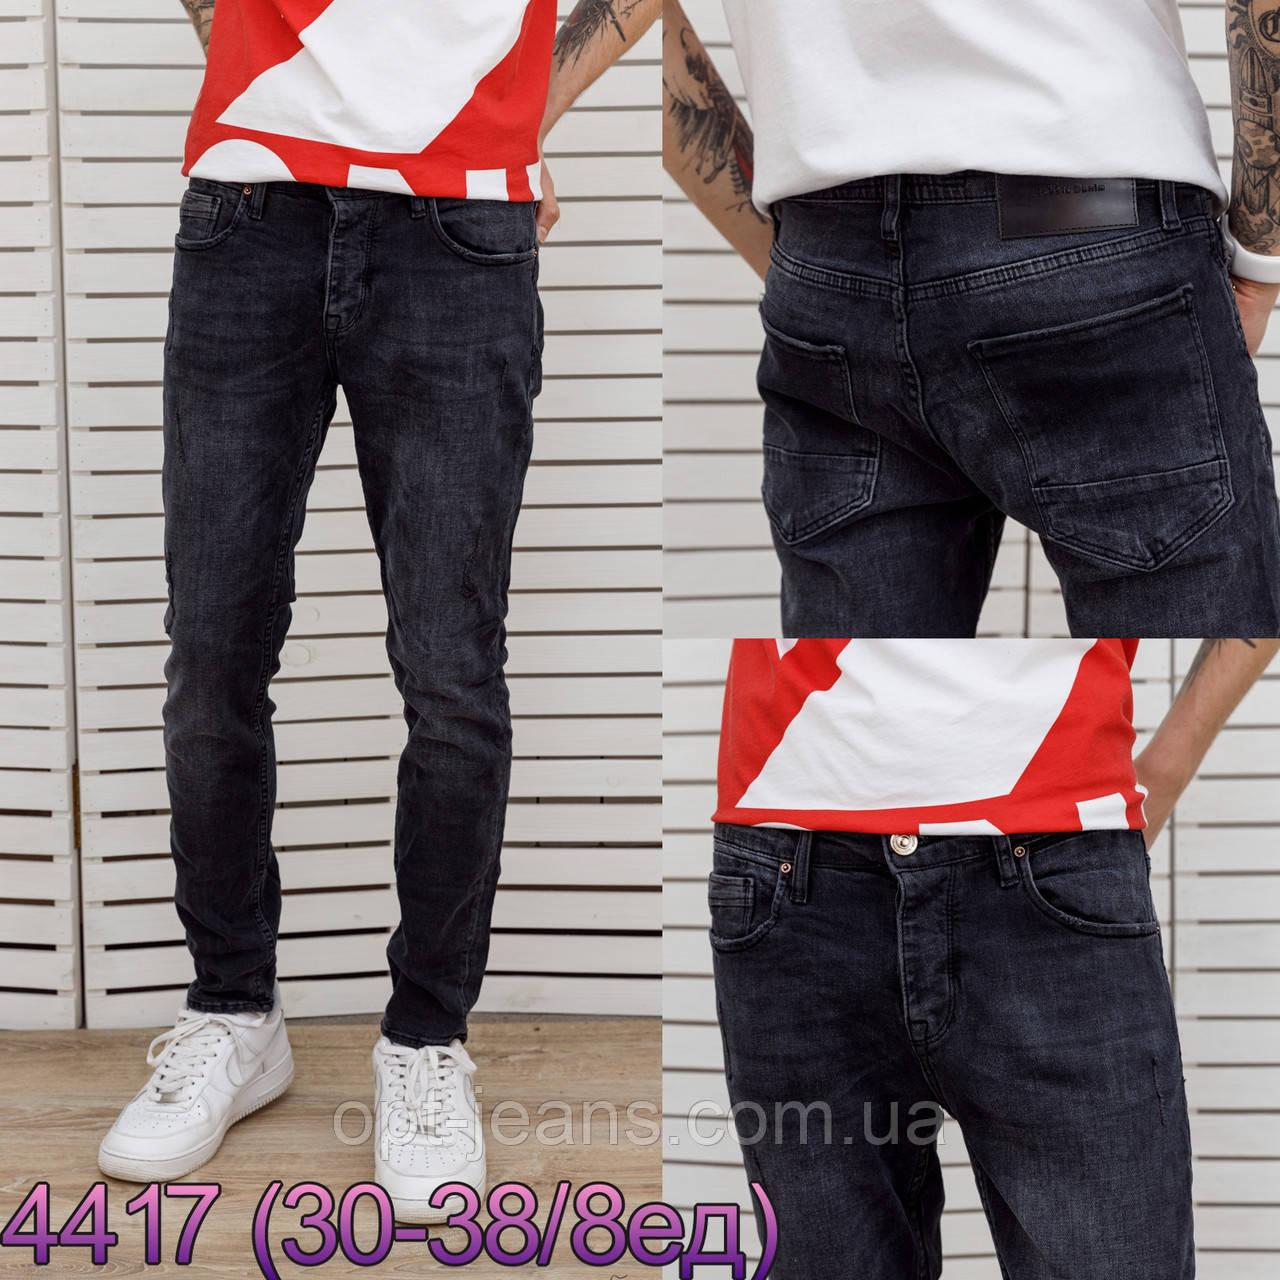 GABBIA мужские джинсы (30-38/8шт.)